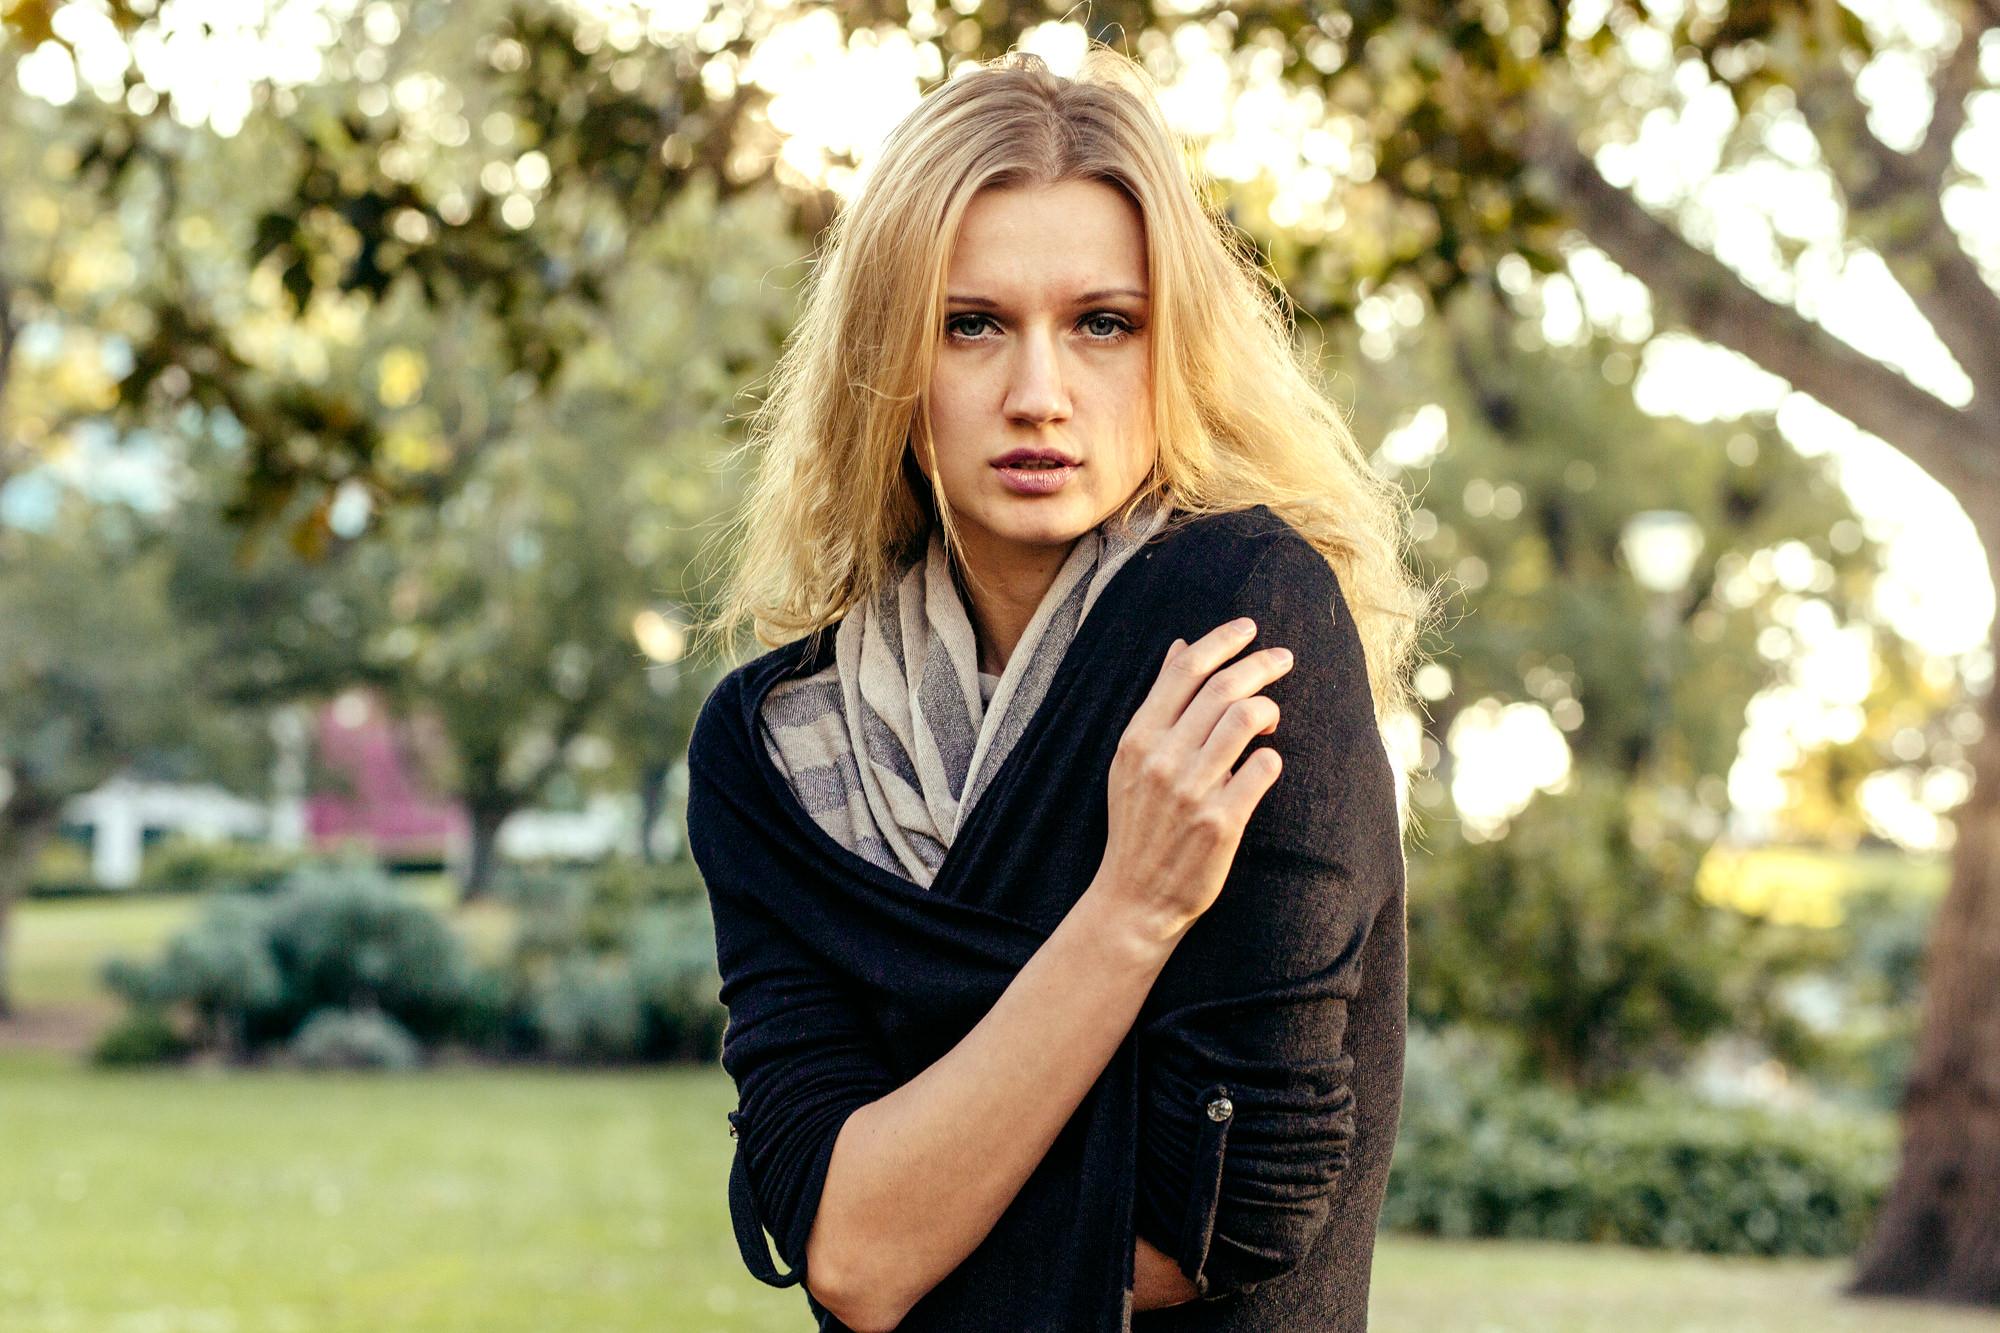 Yaroslavna Martens-_MG_0959-Bearbeitet.jpg